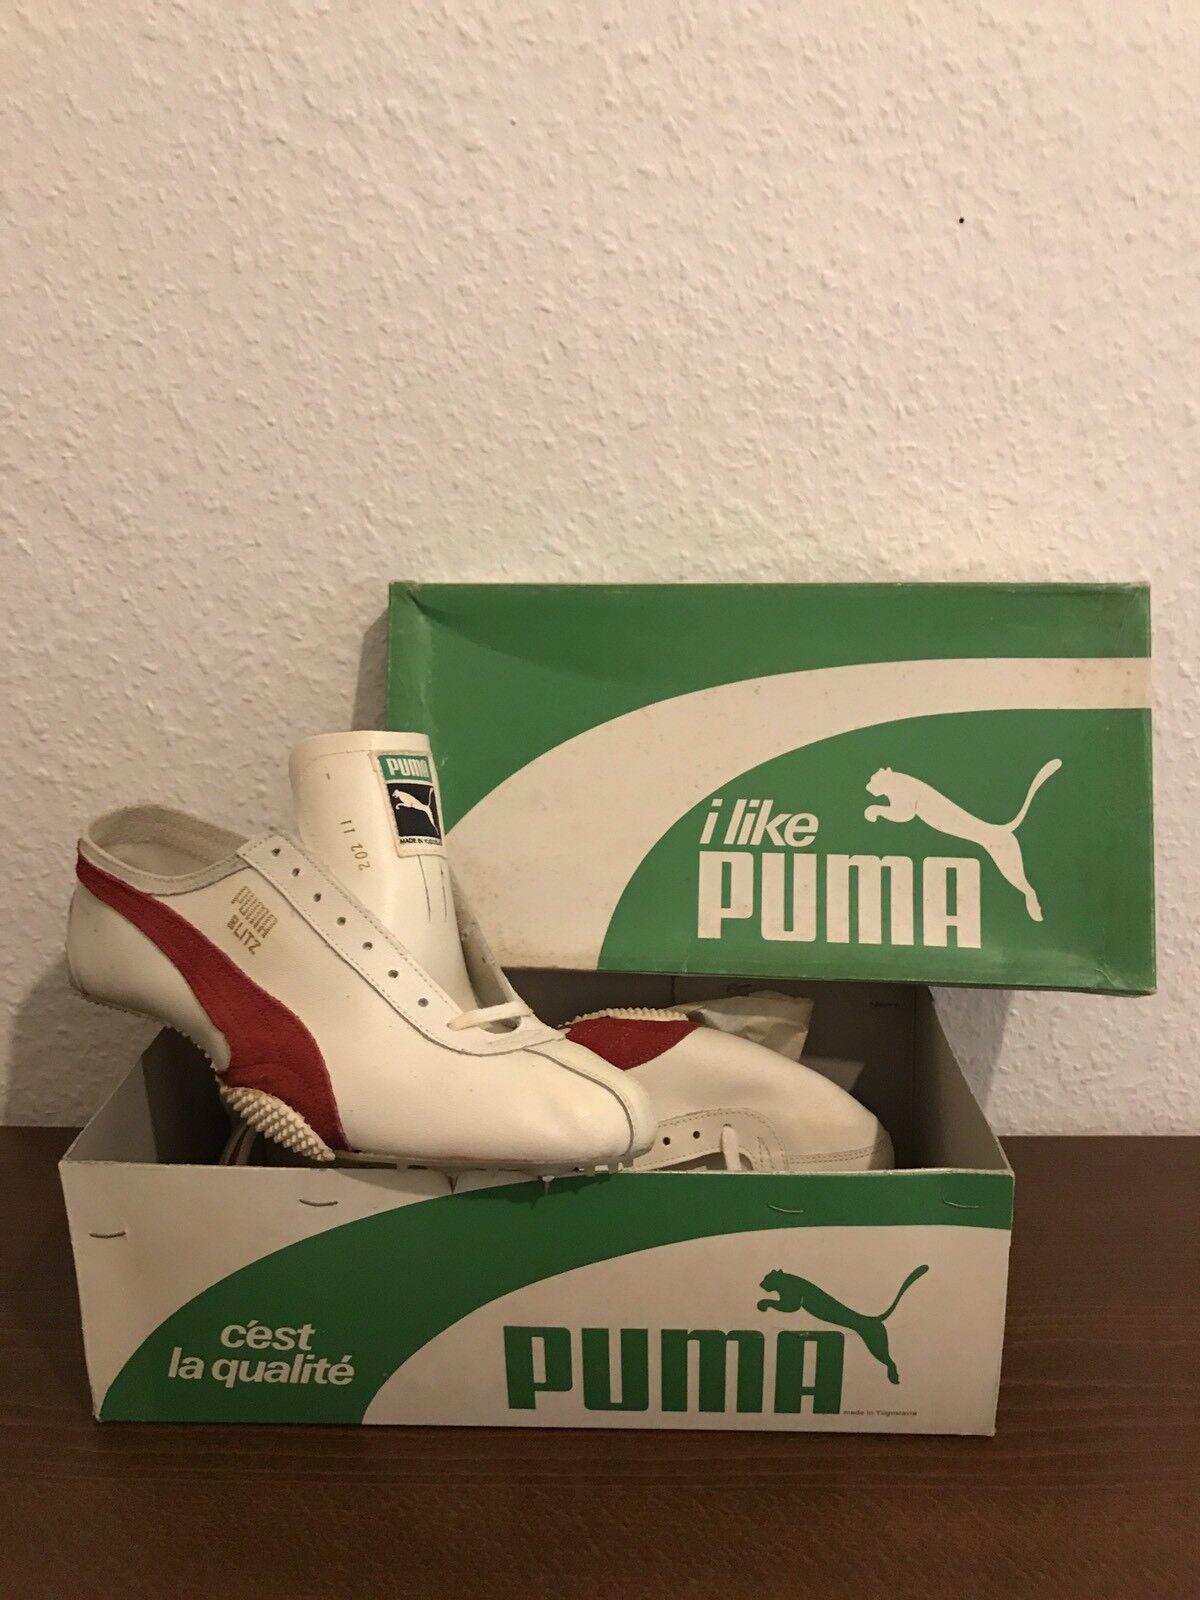 Vintage - puma puma puma blitz laufschuhe 90 11 46 deadstock selten 70er spikes e50978